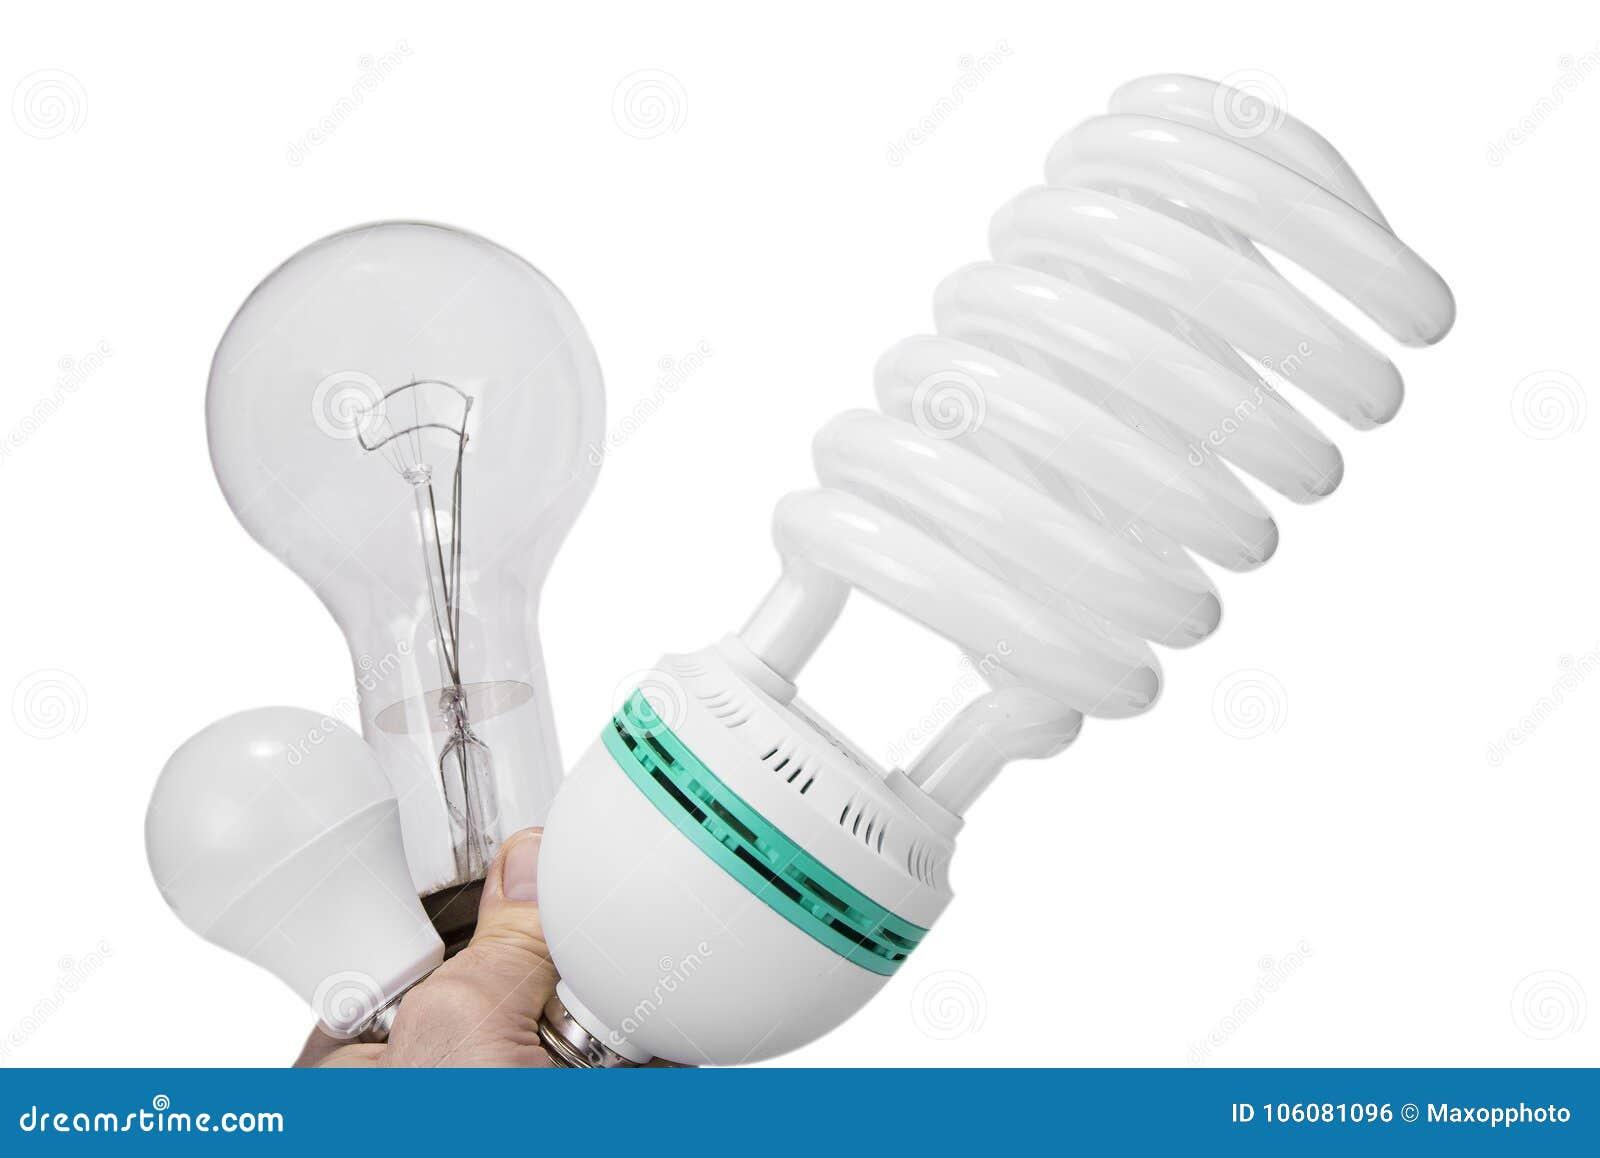 Classic bulb versus compact fluorescent versus new led bulbs.